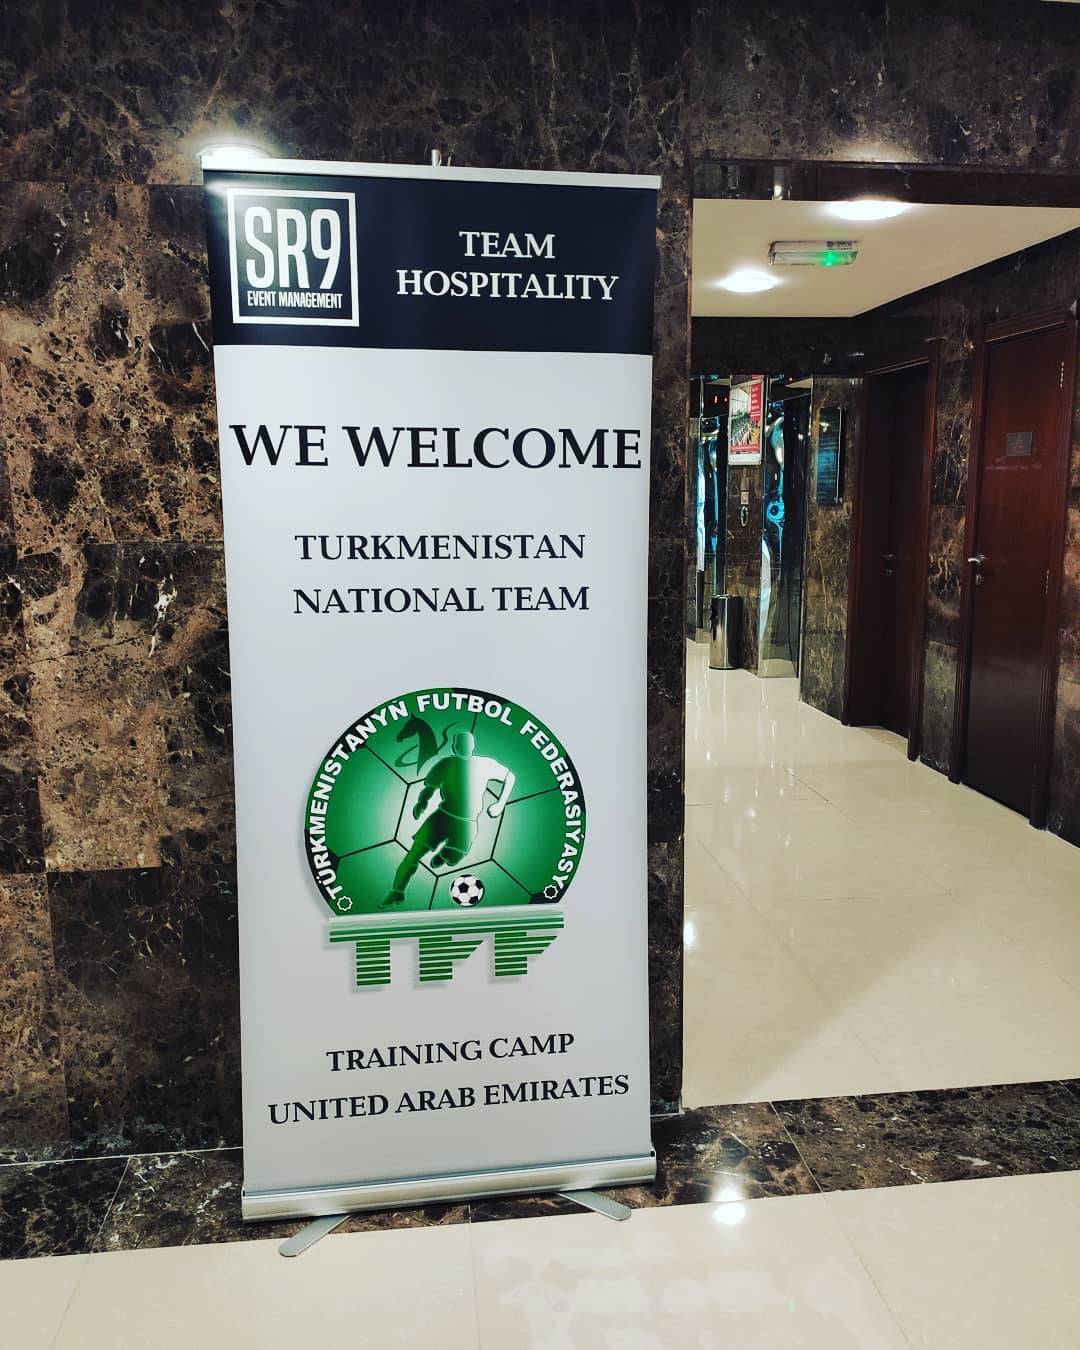 Turkmenistan national football team arrives in Dubai for